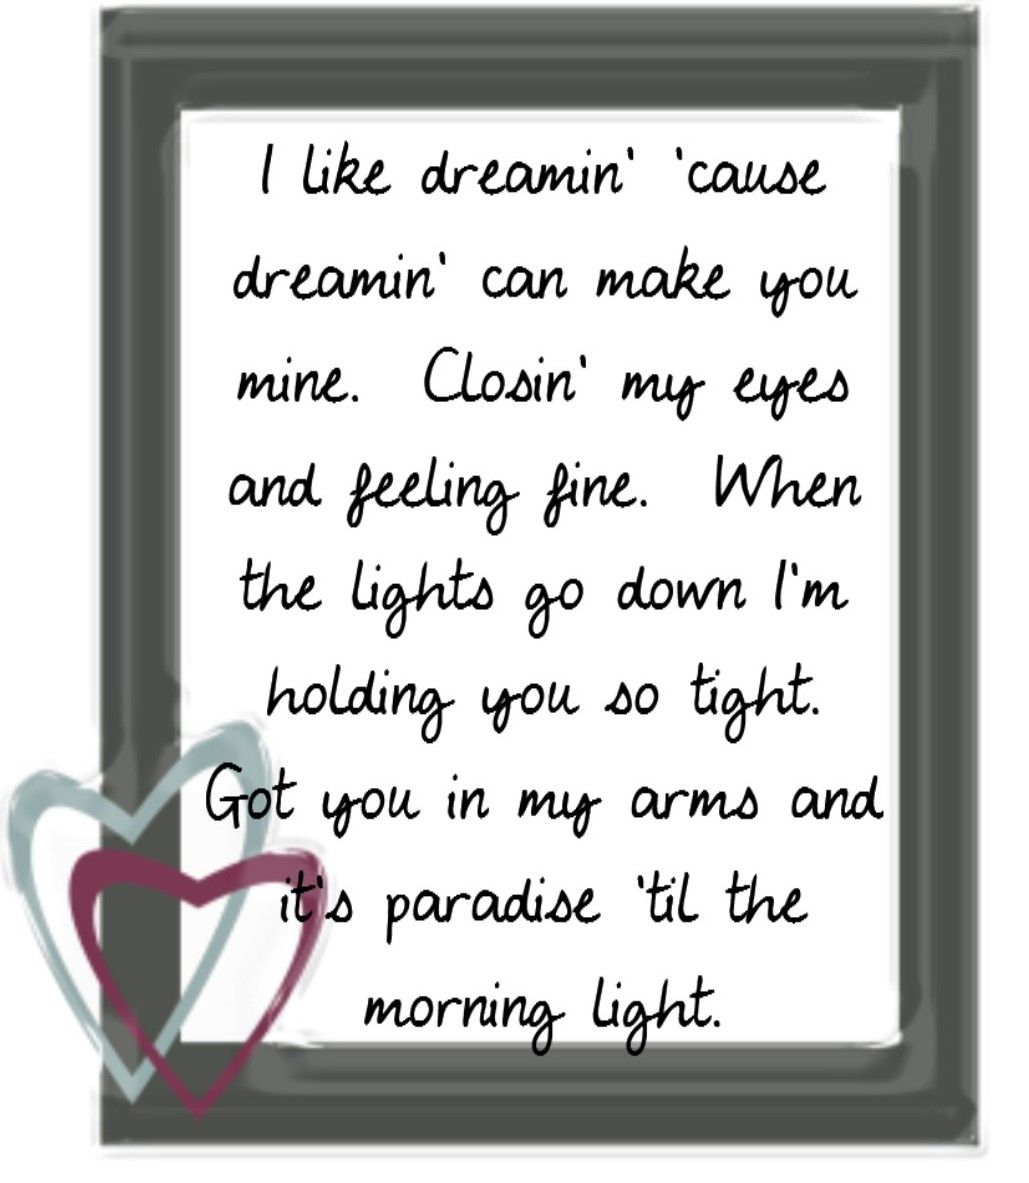 I like dreaming song